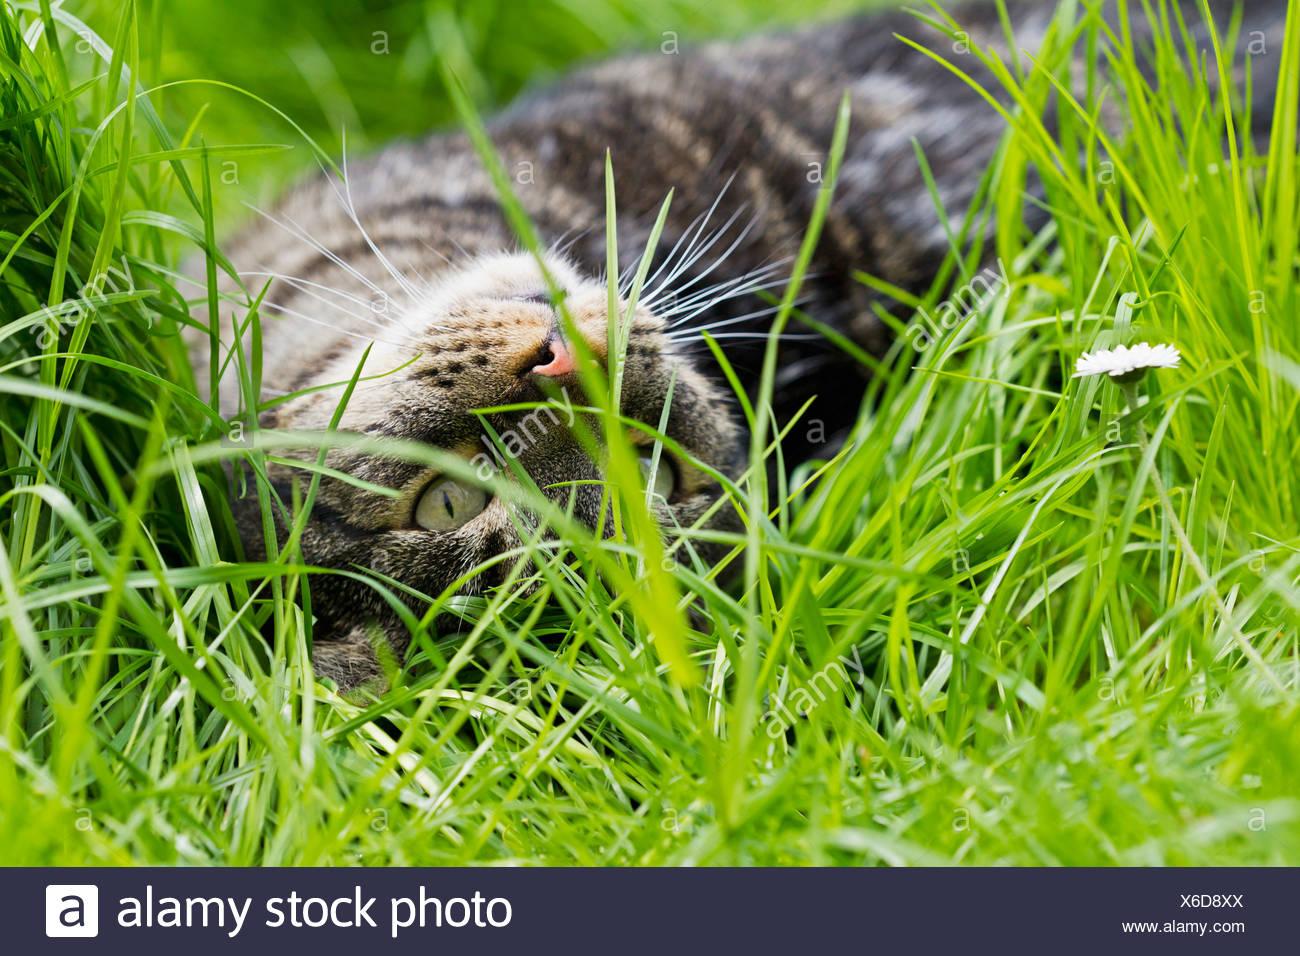 Alemania, Baviera, European Shorthair gato tumbado sobre pradera Imagen De Stock